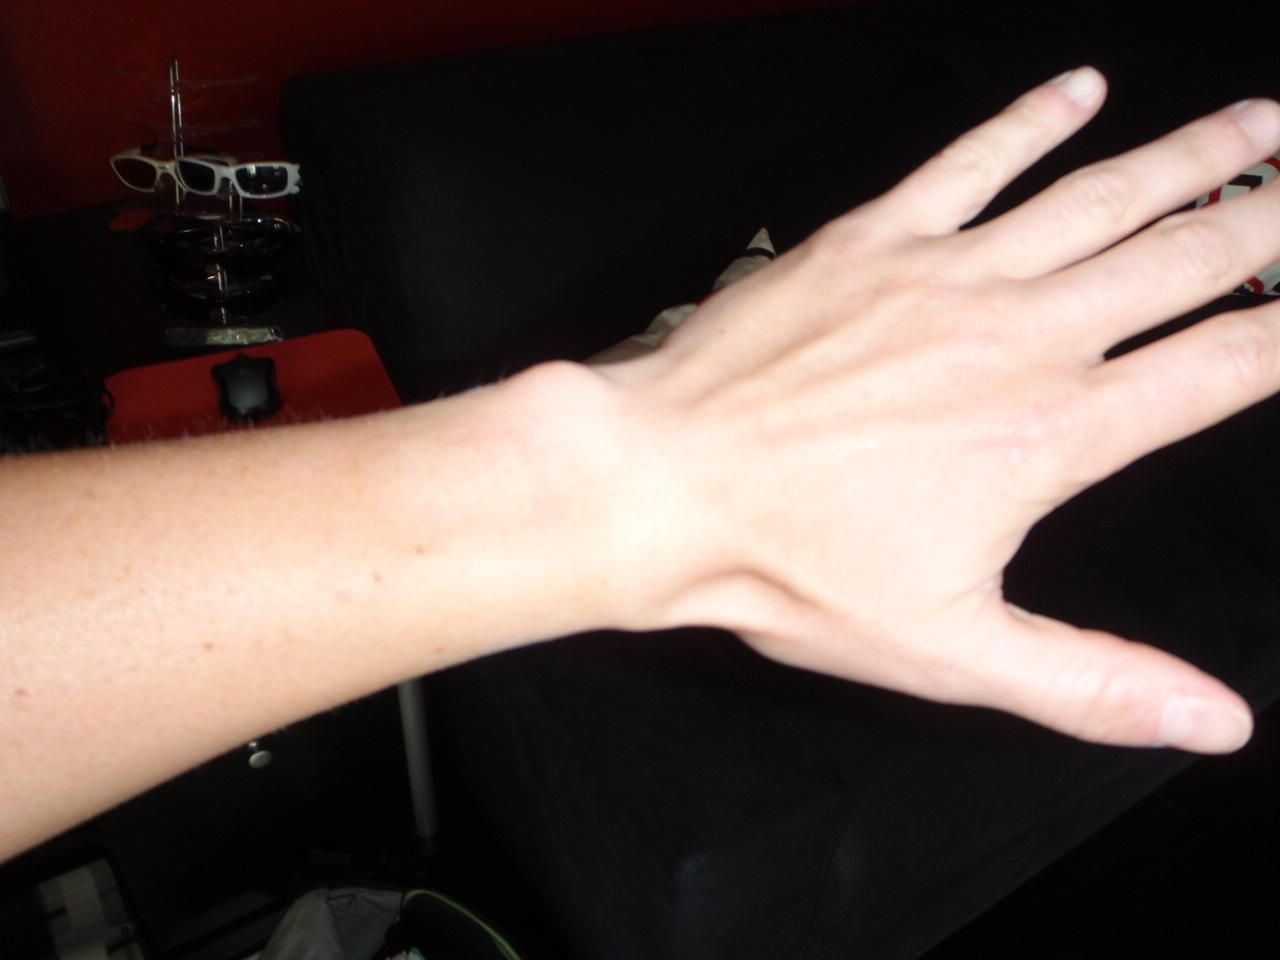 i have a small wrist